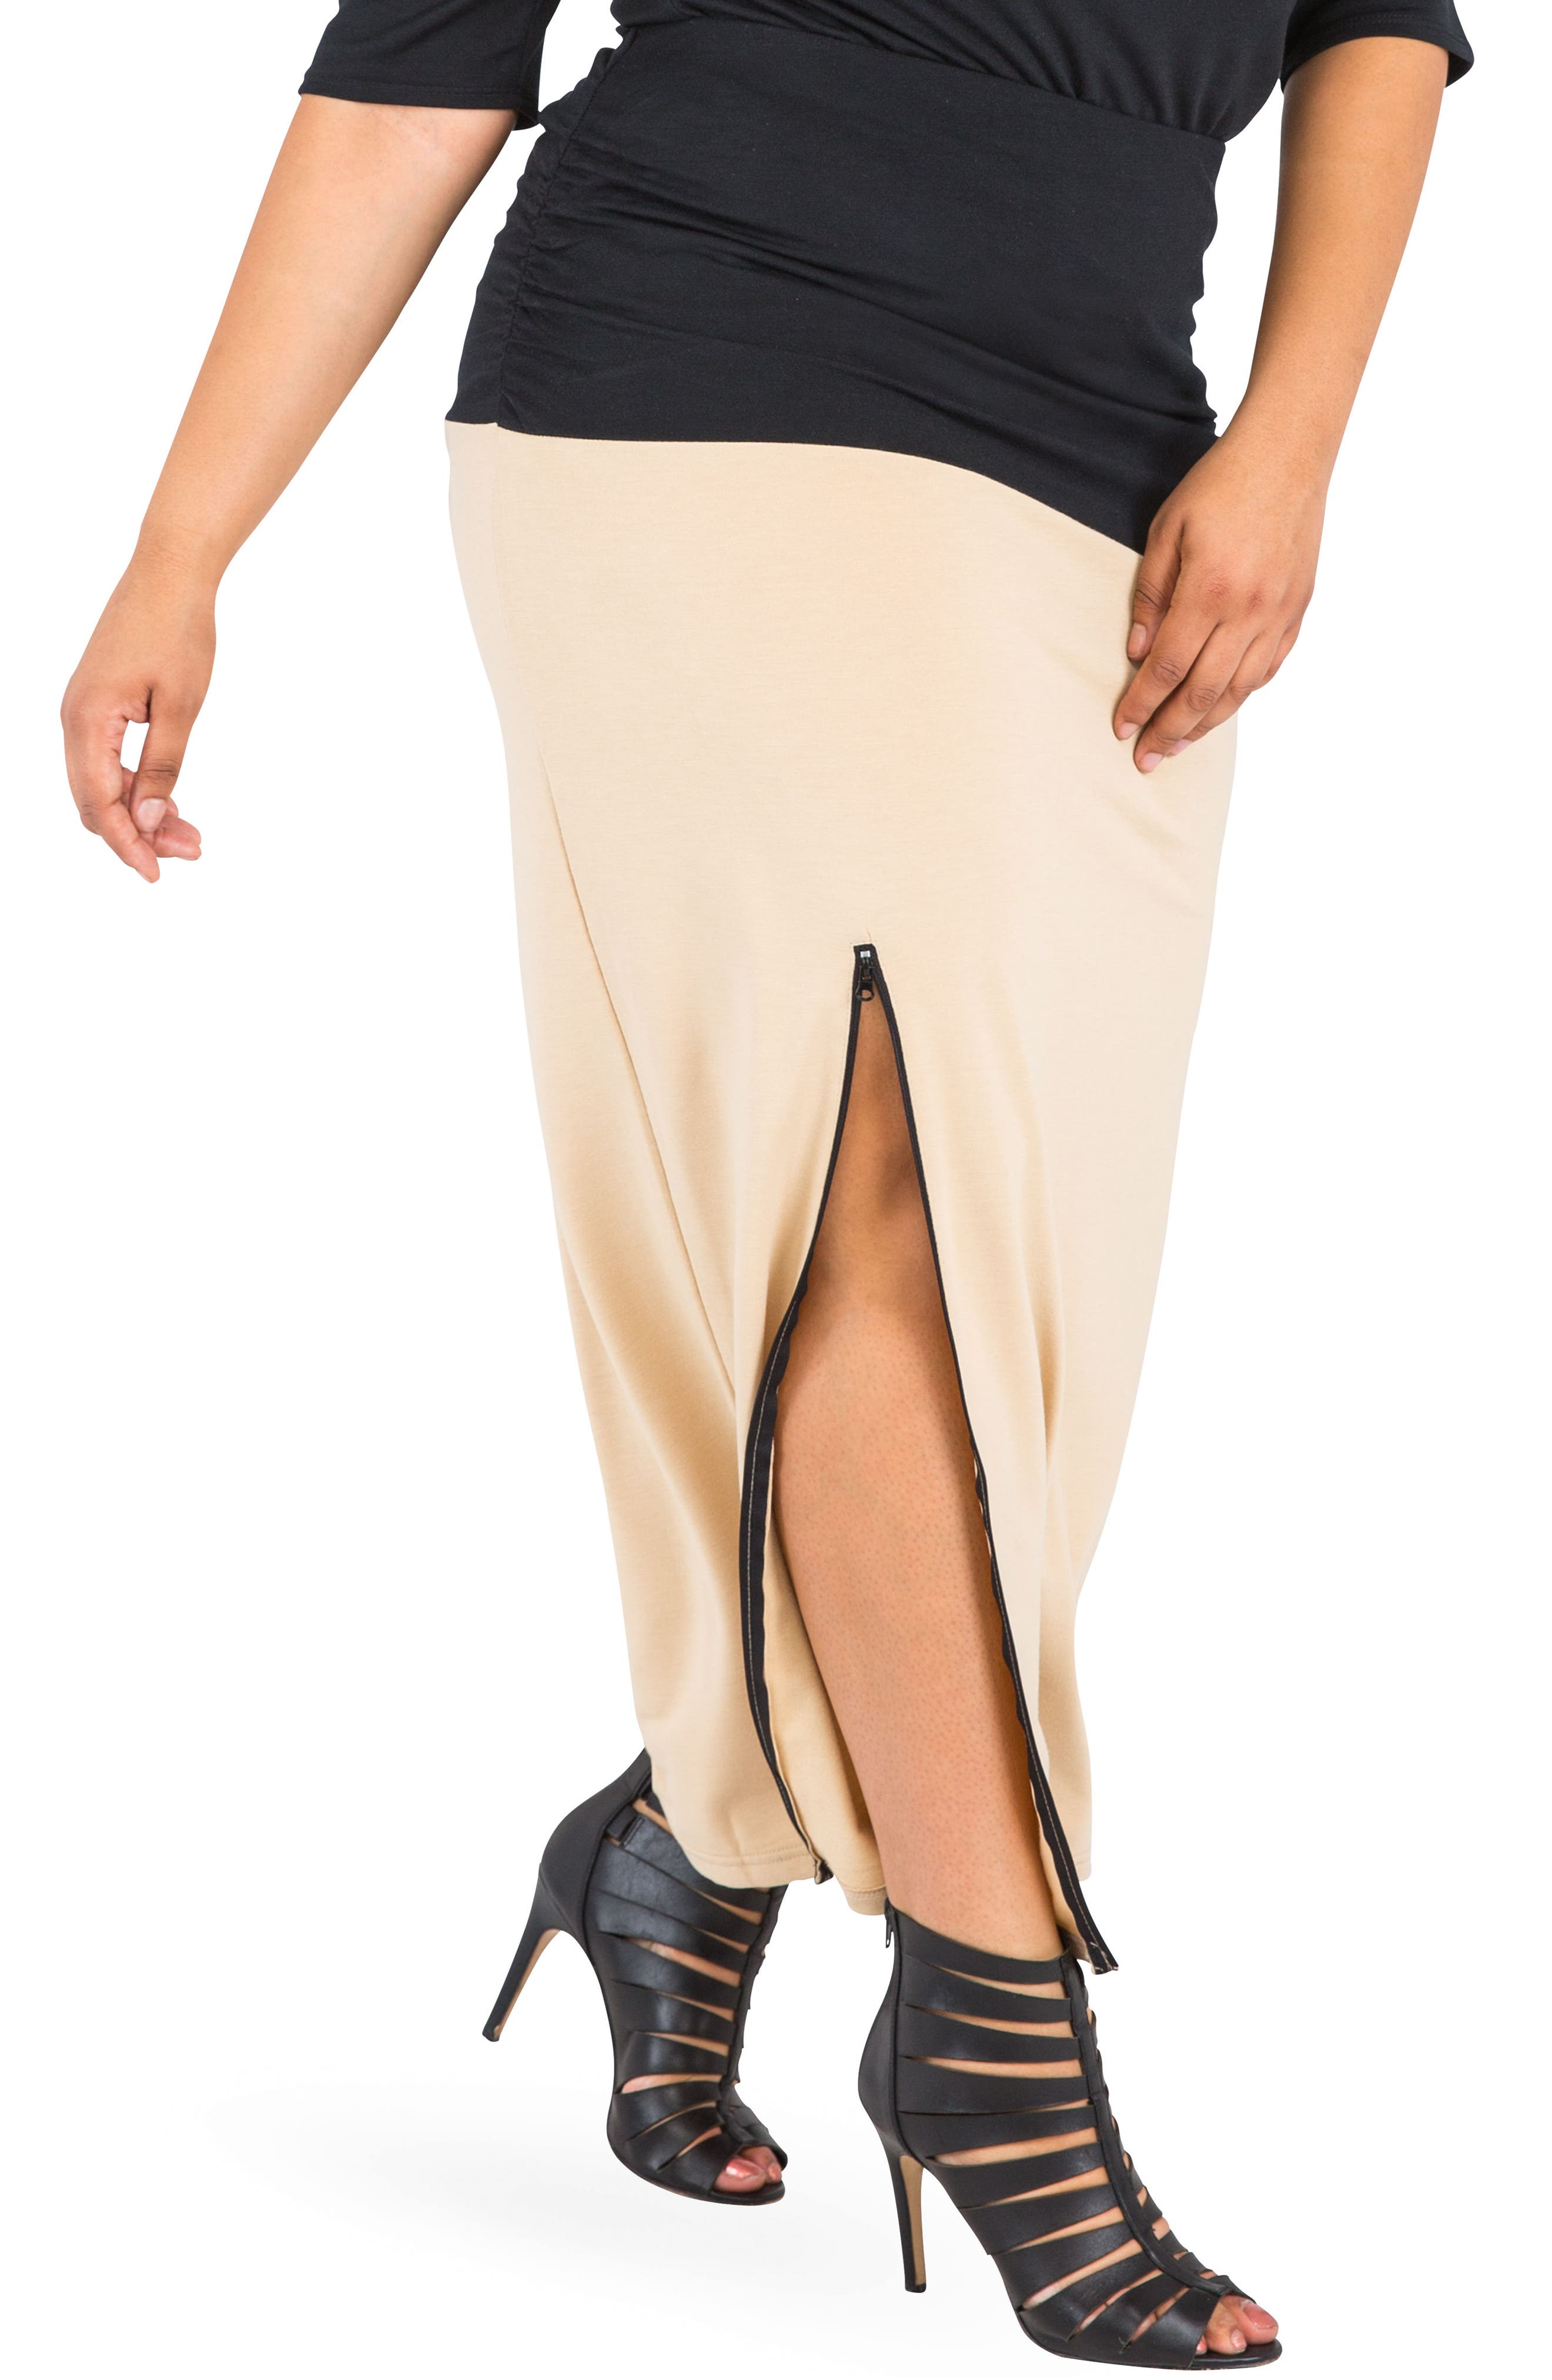 Alternate Image 1 Selected - Poetic Justice Kandi Zip Slit Maxi Skirt (Plus Size)